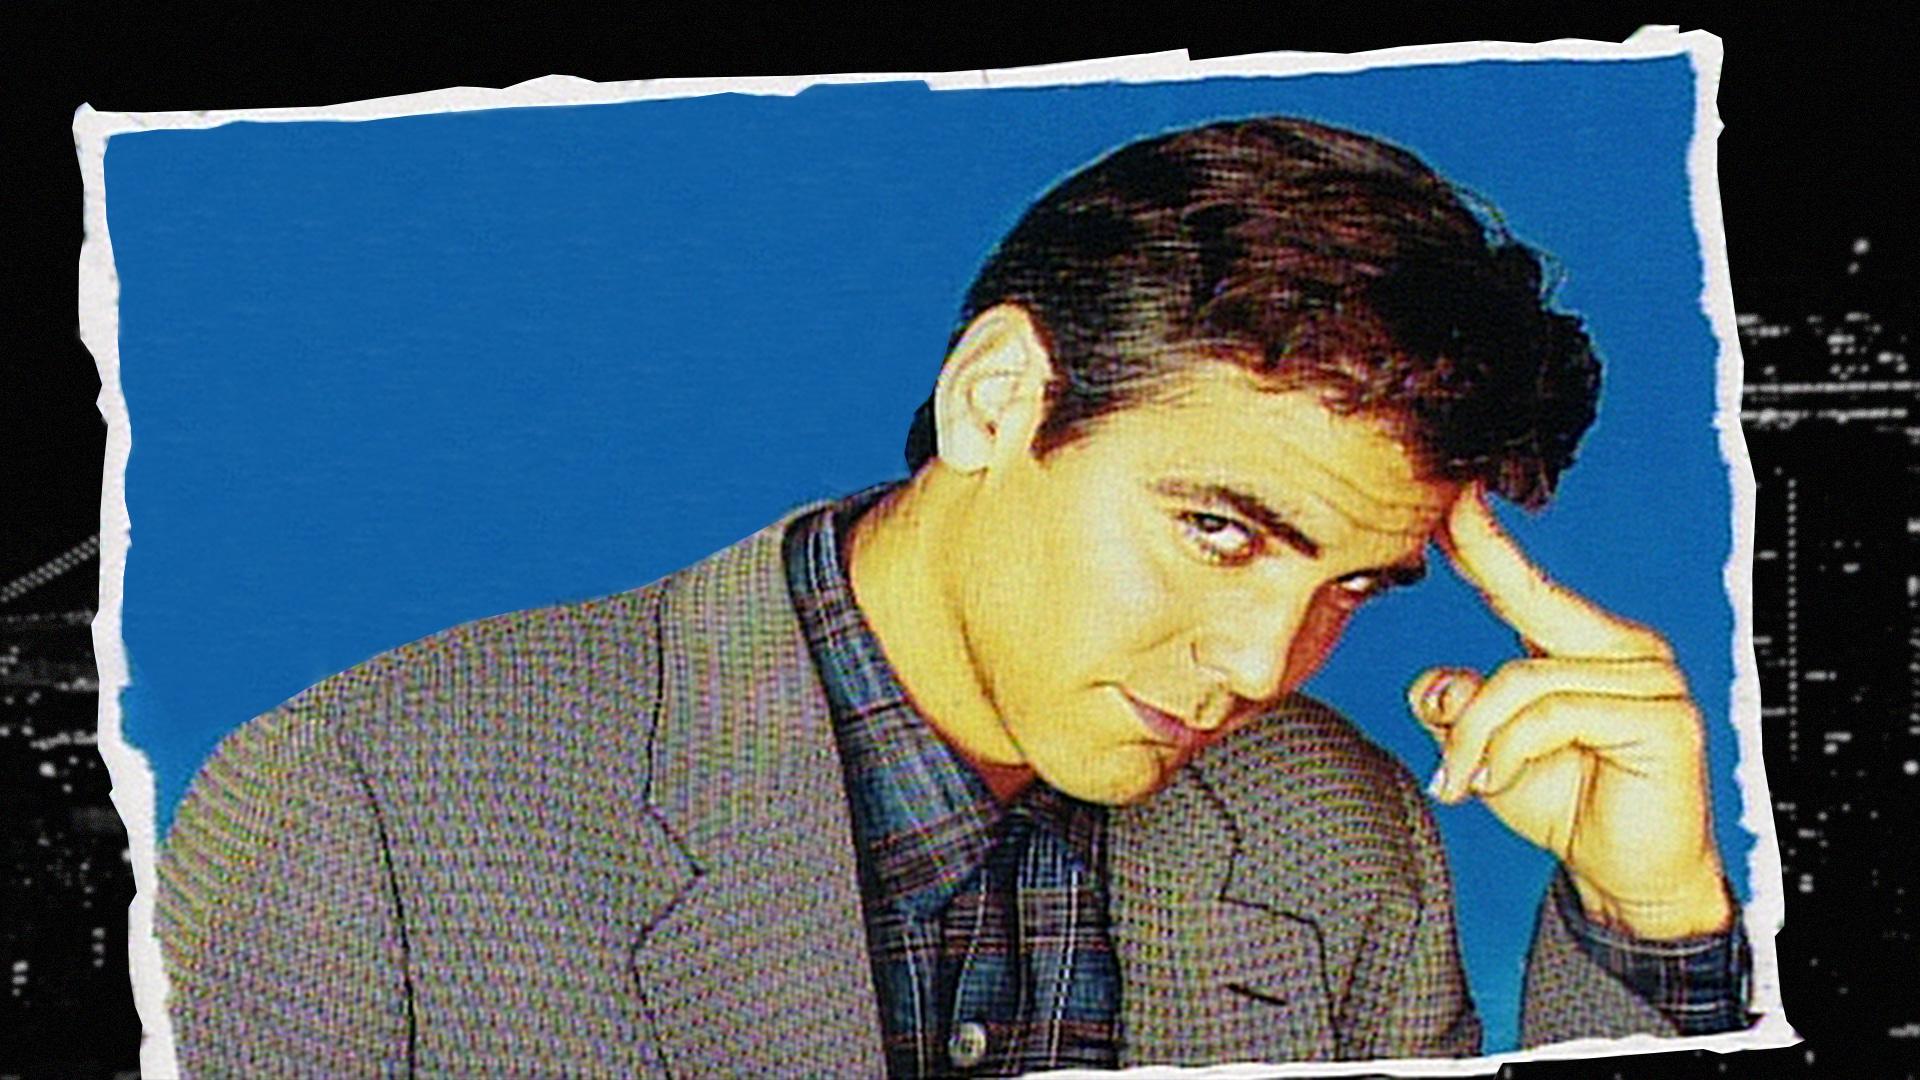 George Clooney: February 25, 1995